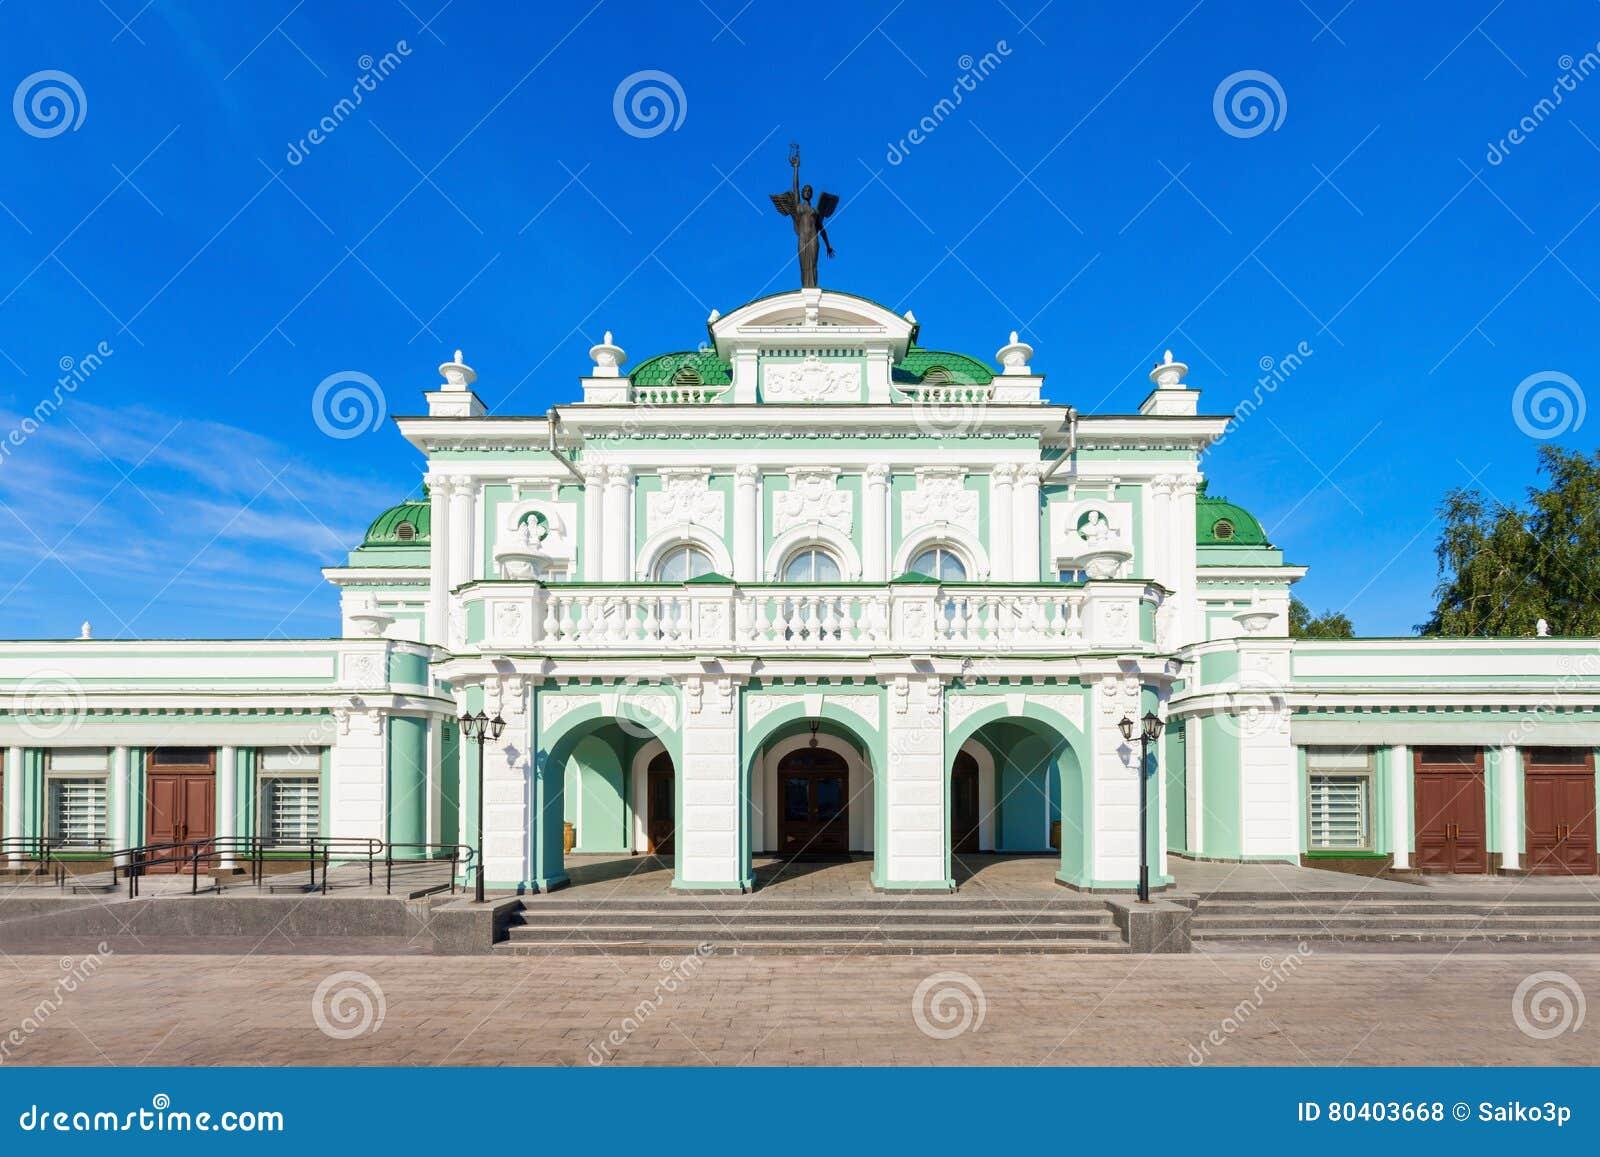 O teatro de Omsk, Rússia